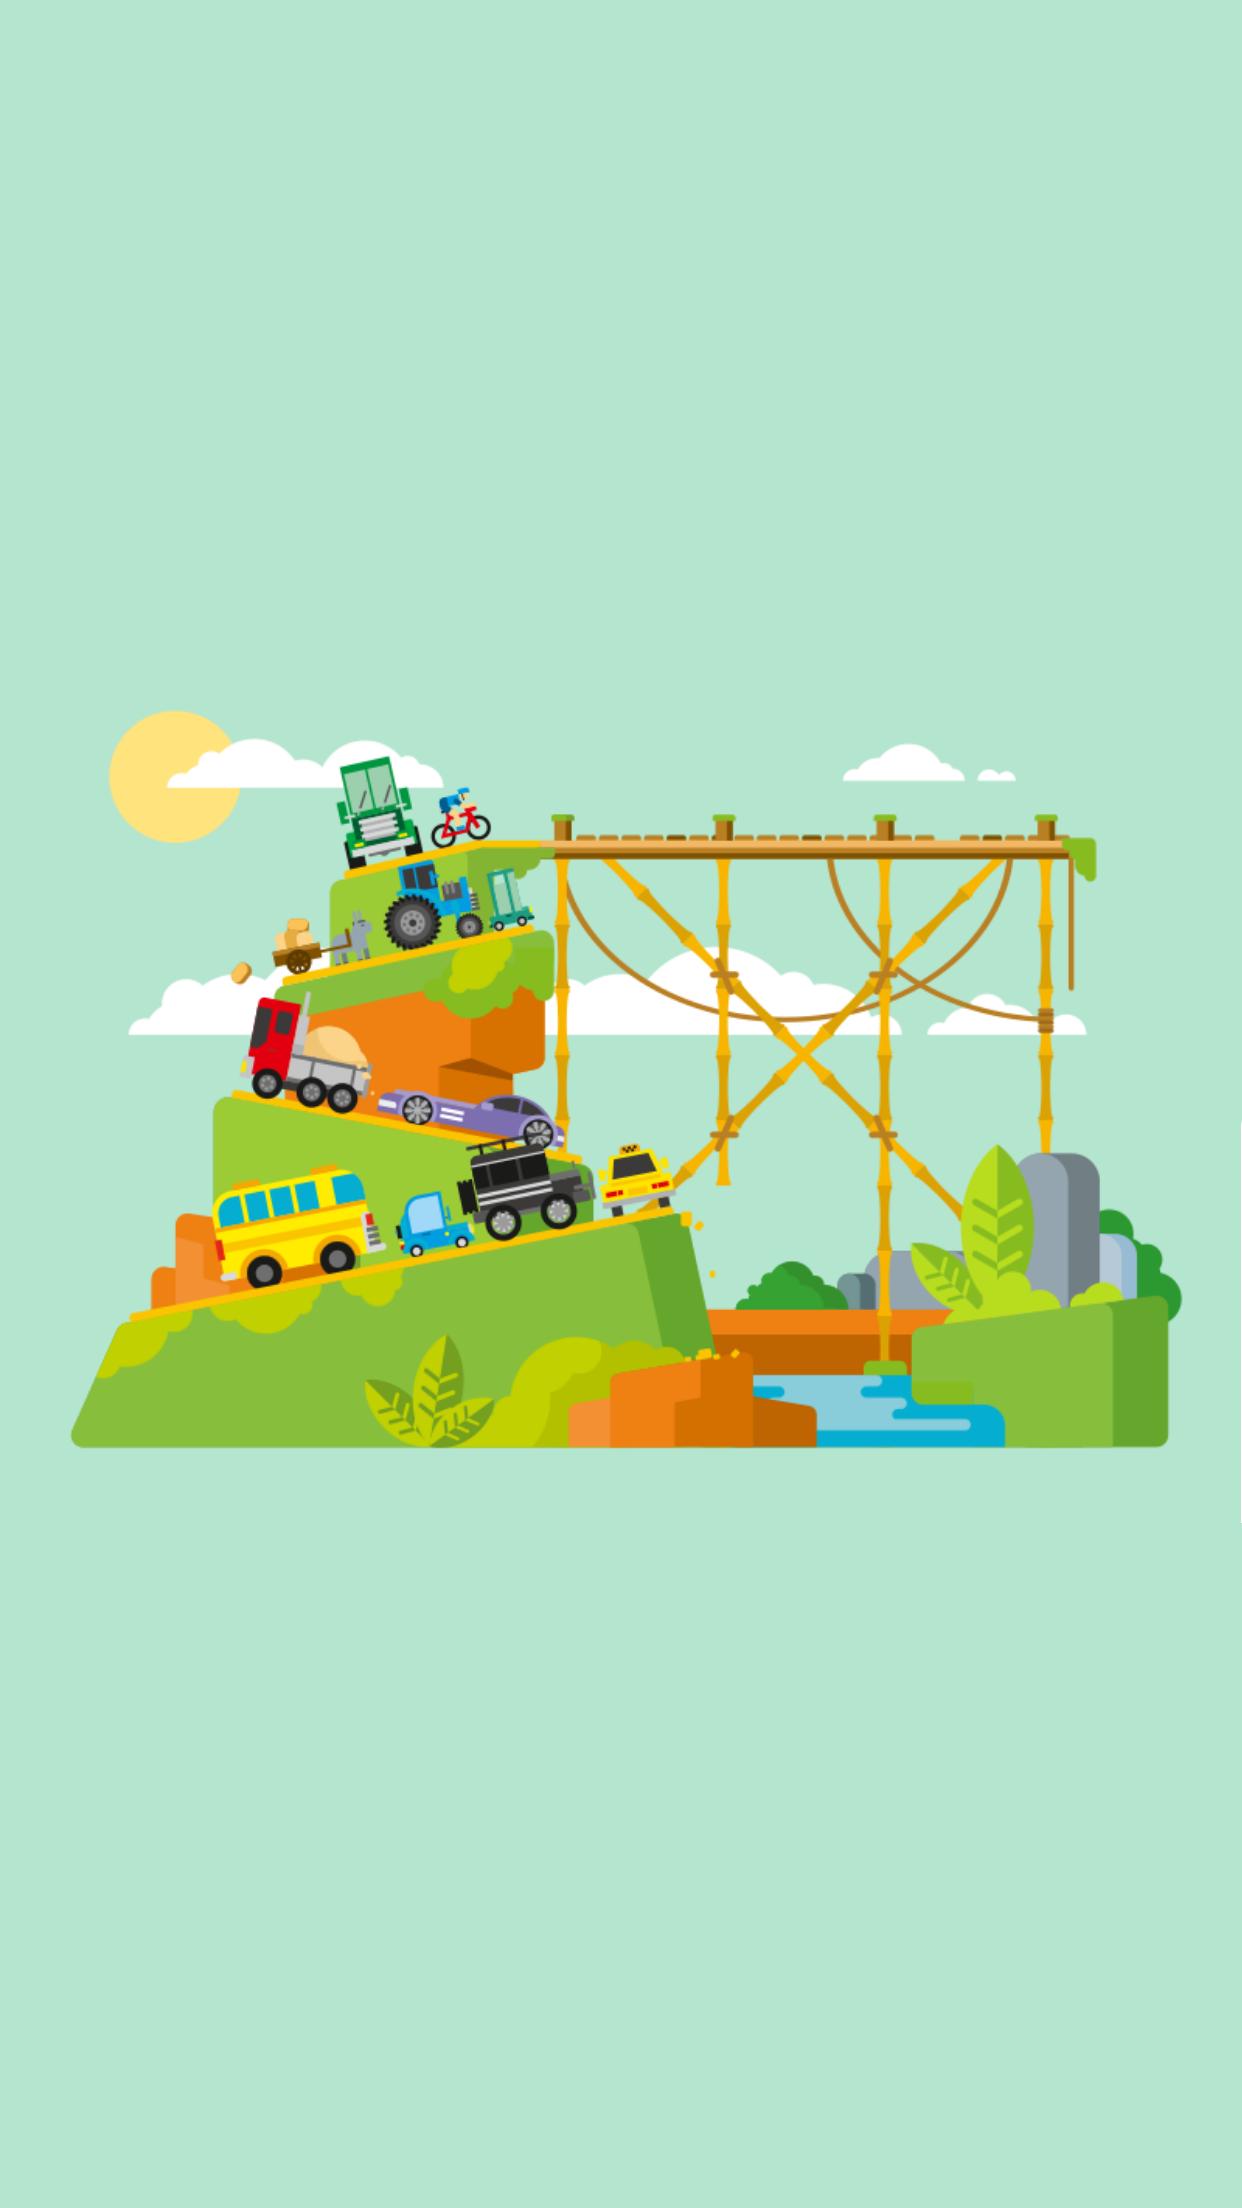 Hintergrundbilder : Illustration, Fahrzeug, Karikatur, Spielplatz ...